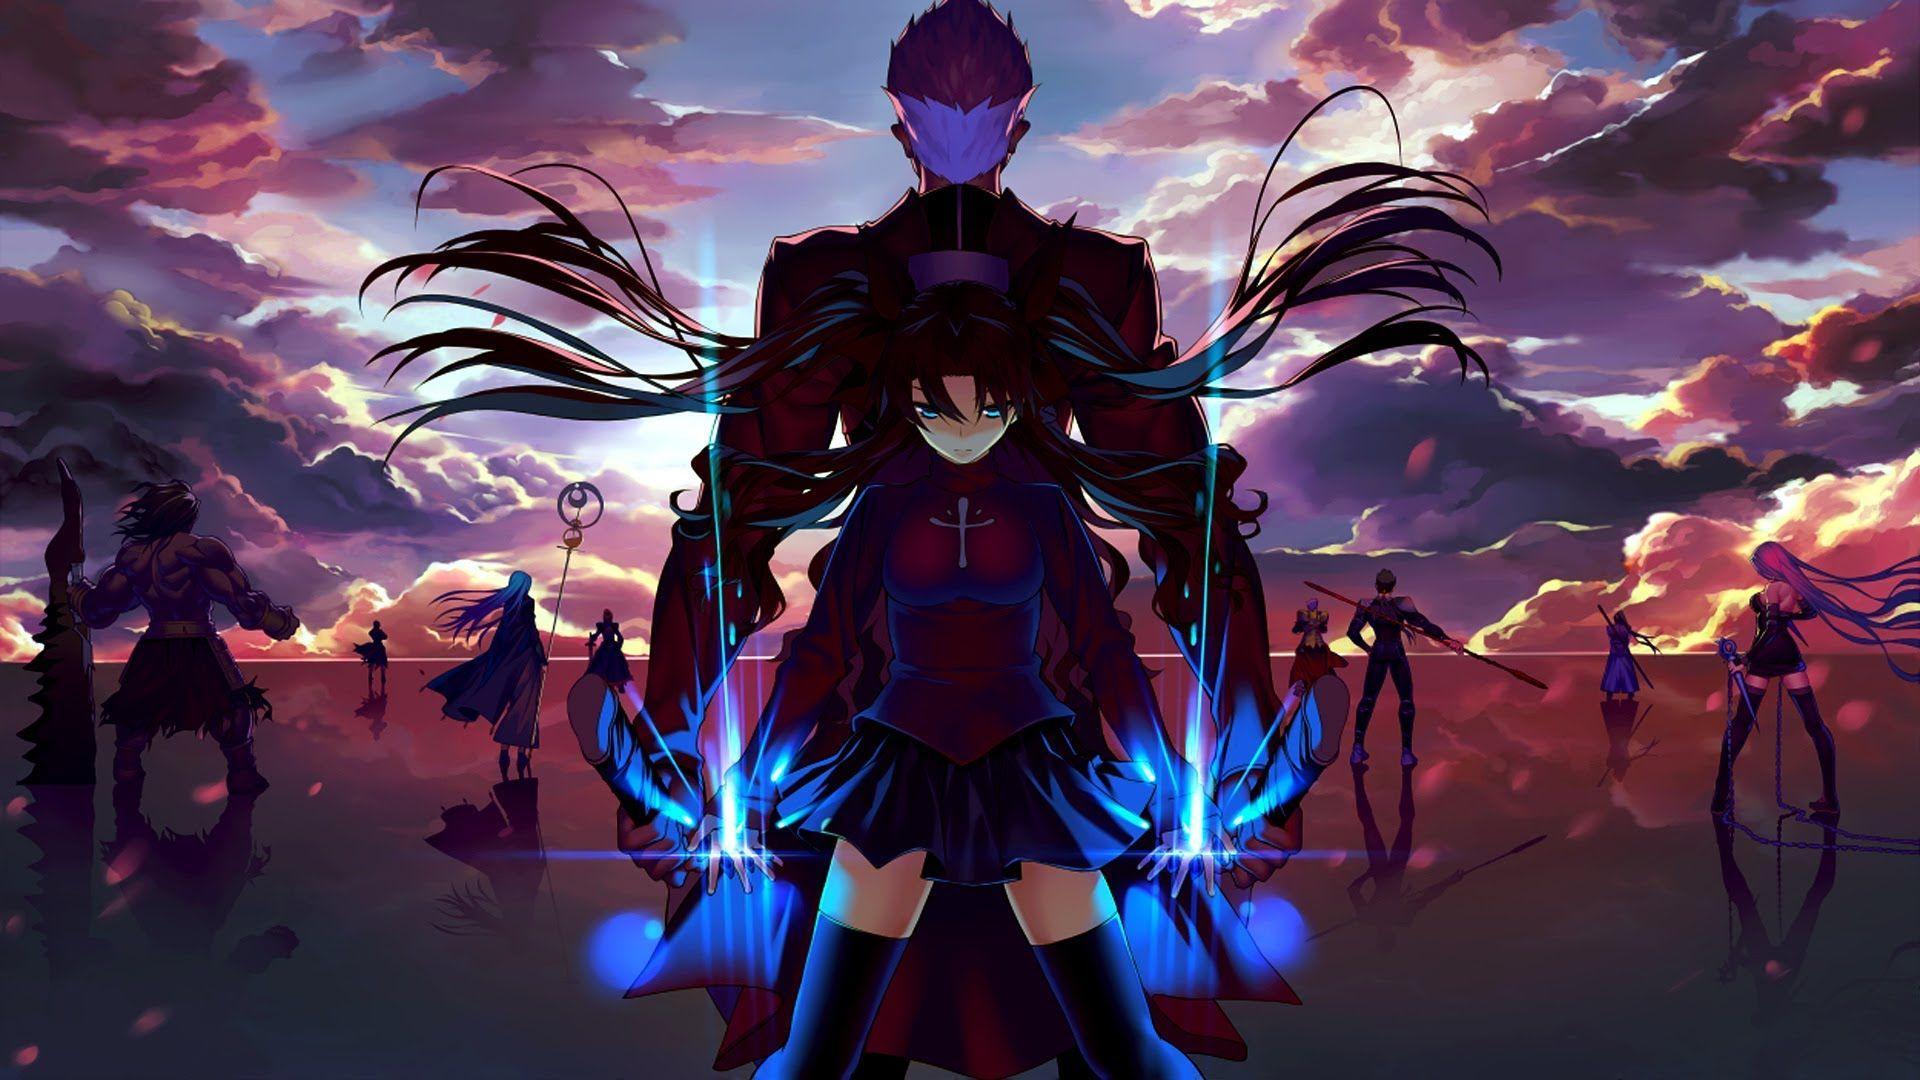 Download 7000 Wallpaper Anime Hd Couple HD Terbaik